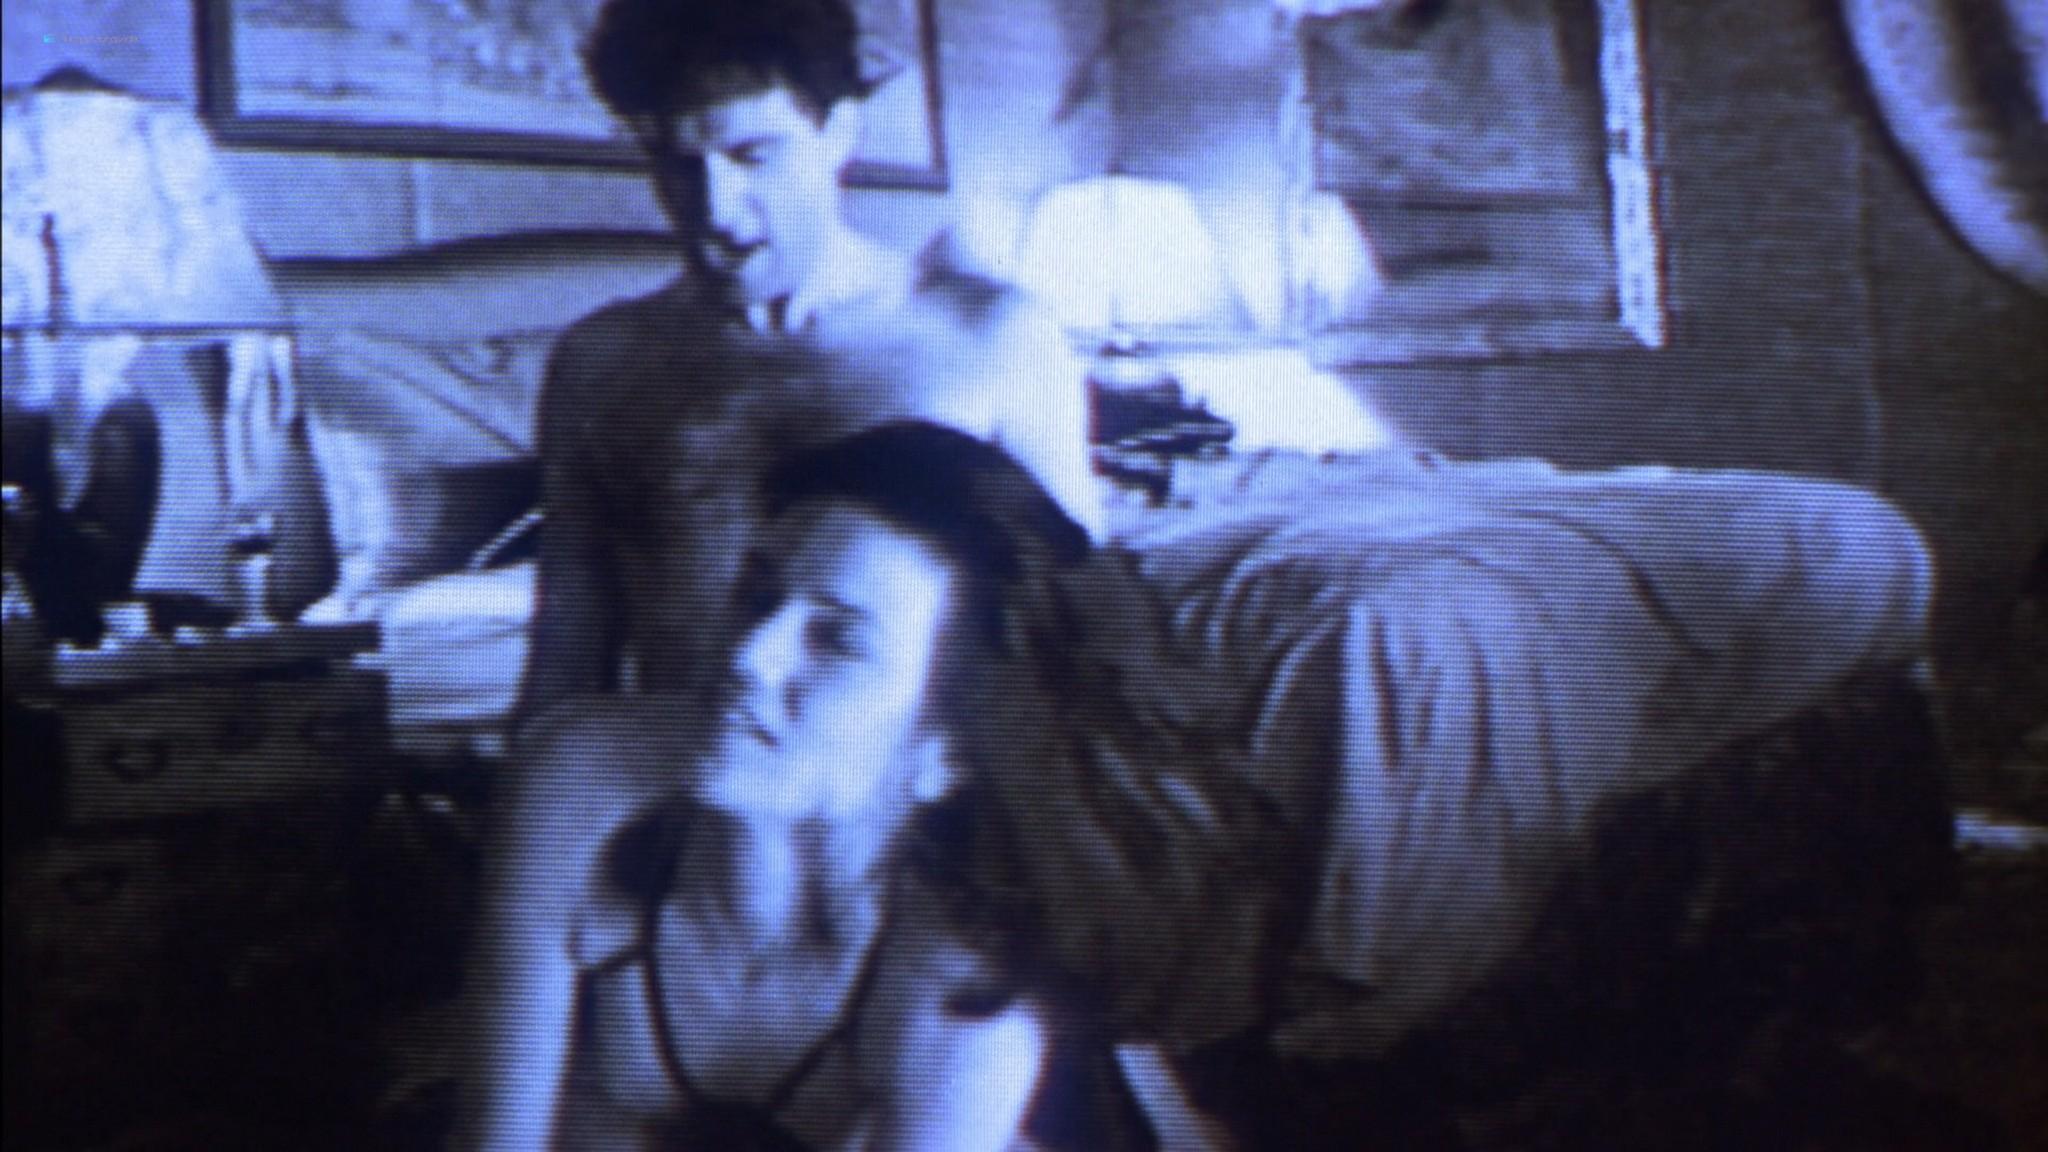 Linda Fiorentino nude Angie Everhart nude full frontal - Jade (1995) HD 1080p BluRay (13)